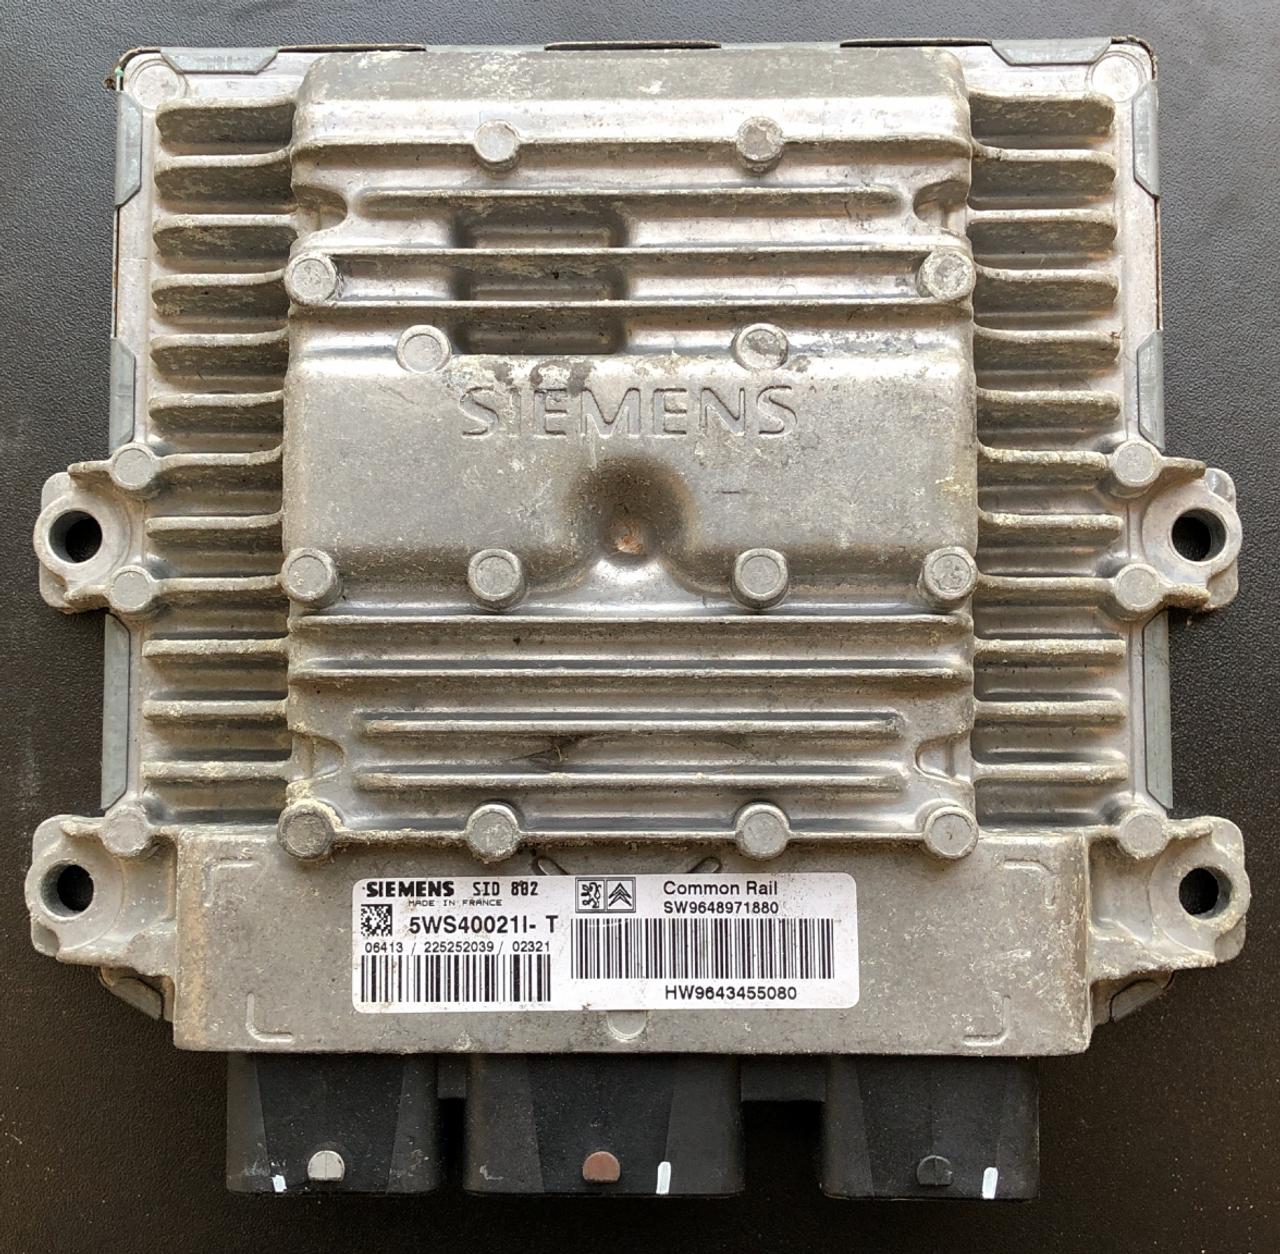 Peugeot / Citroen, SID802, 5WS40021I-T, SW9648971880, HW9643455080